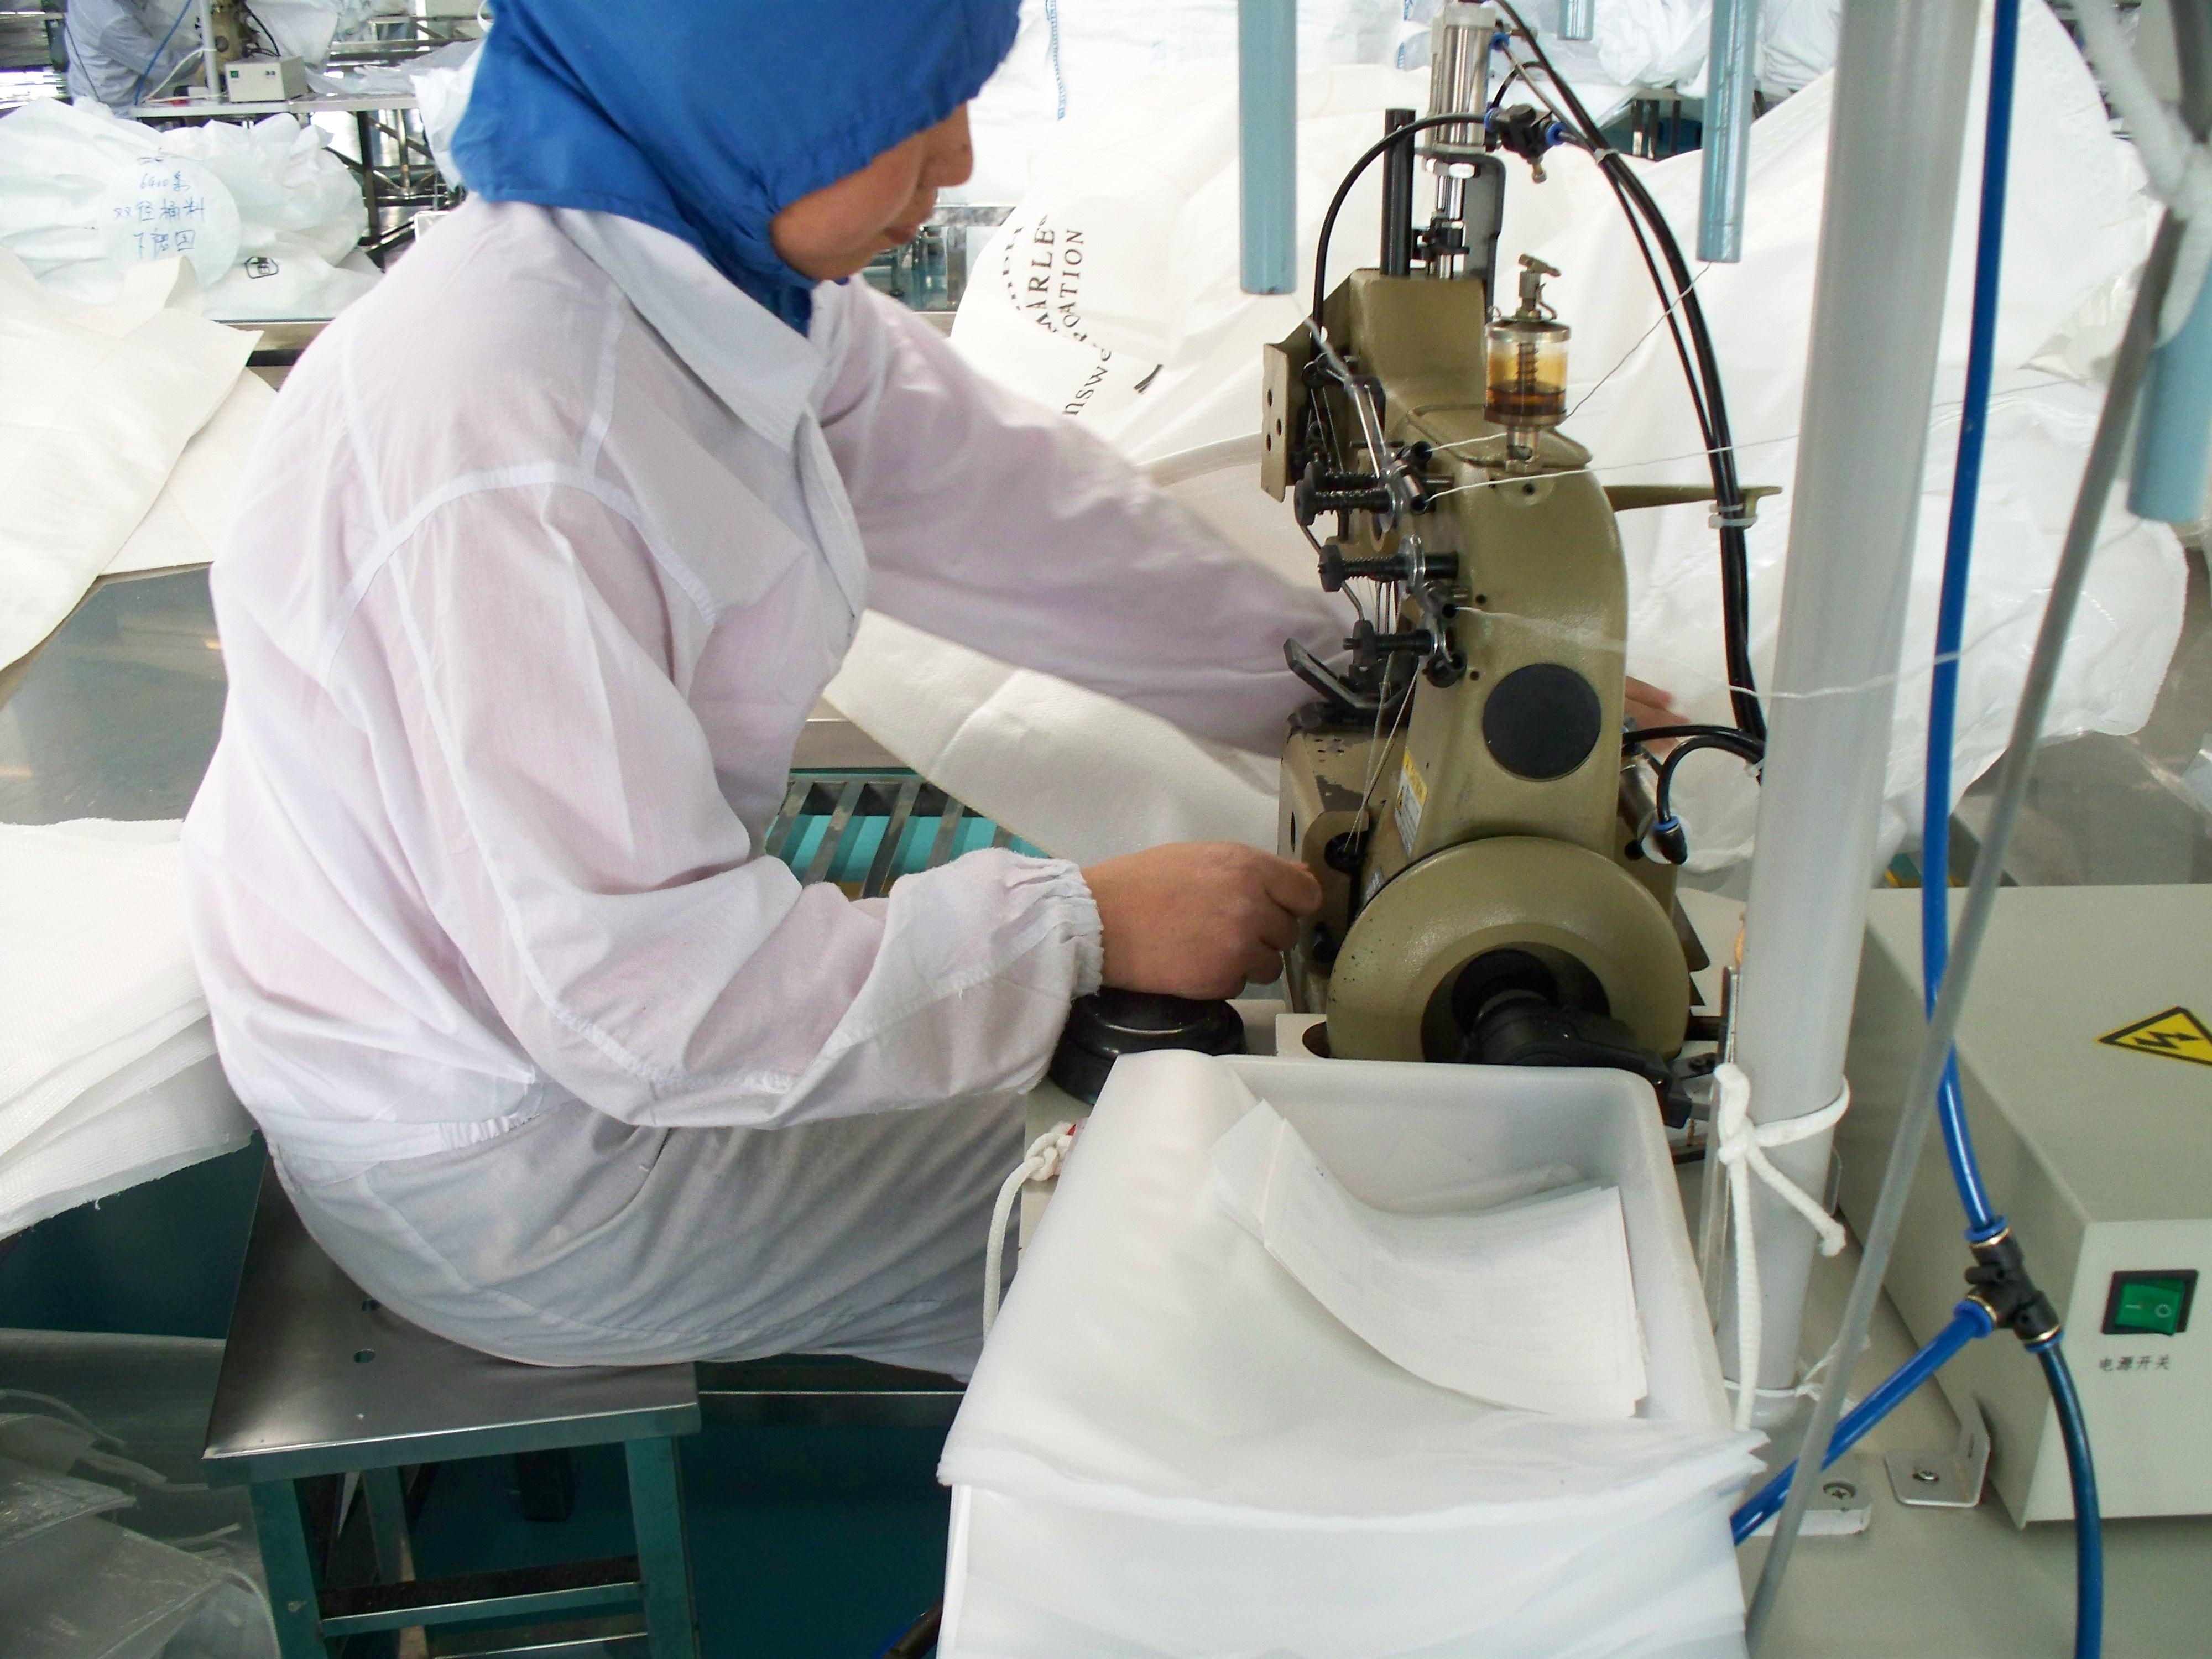 Custom-Bags-Image-2-Fabric-Sewing-1.jpg